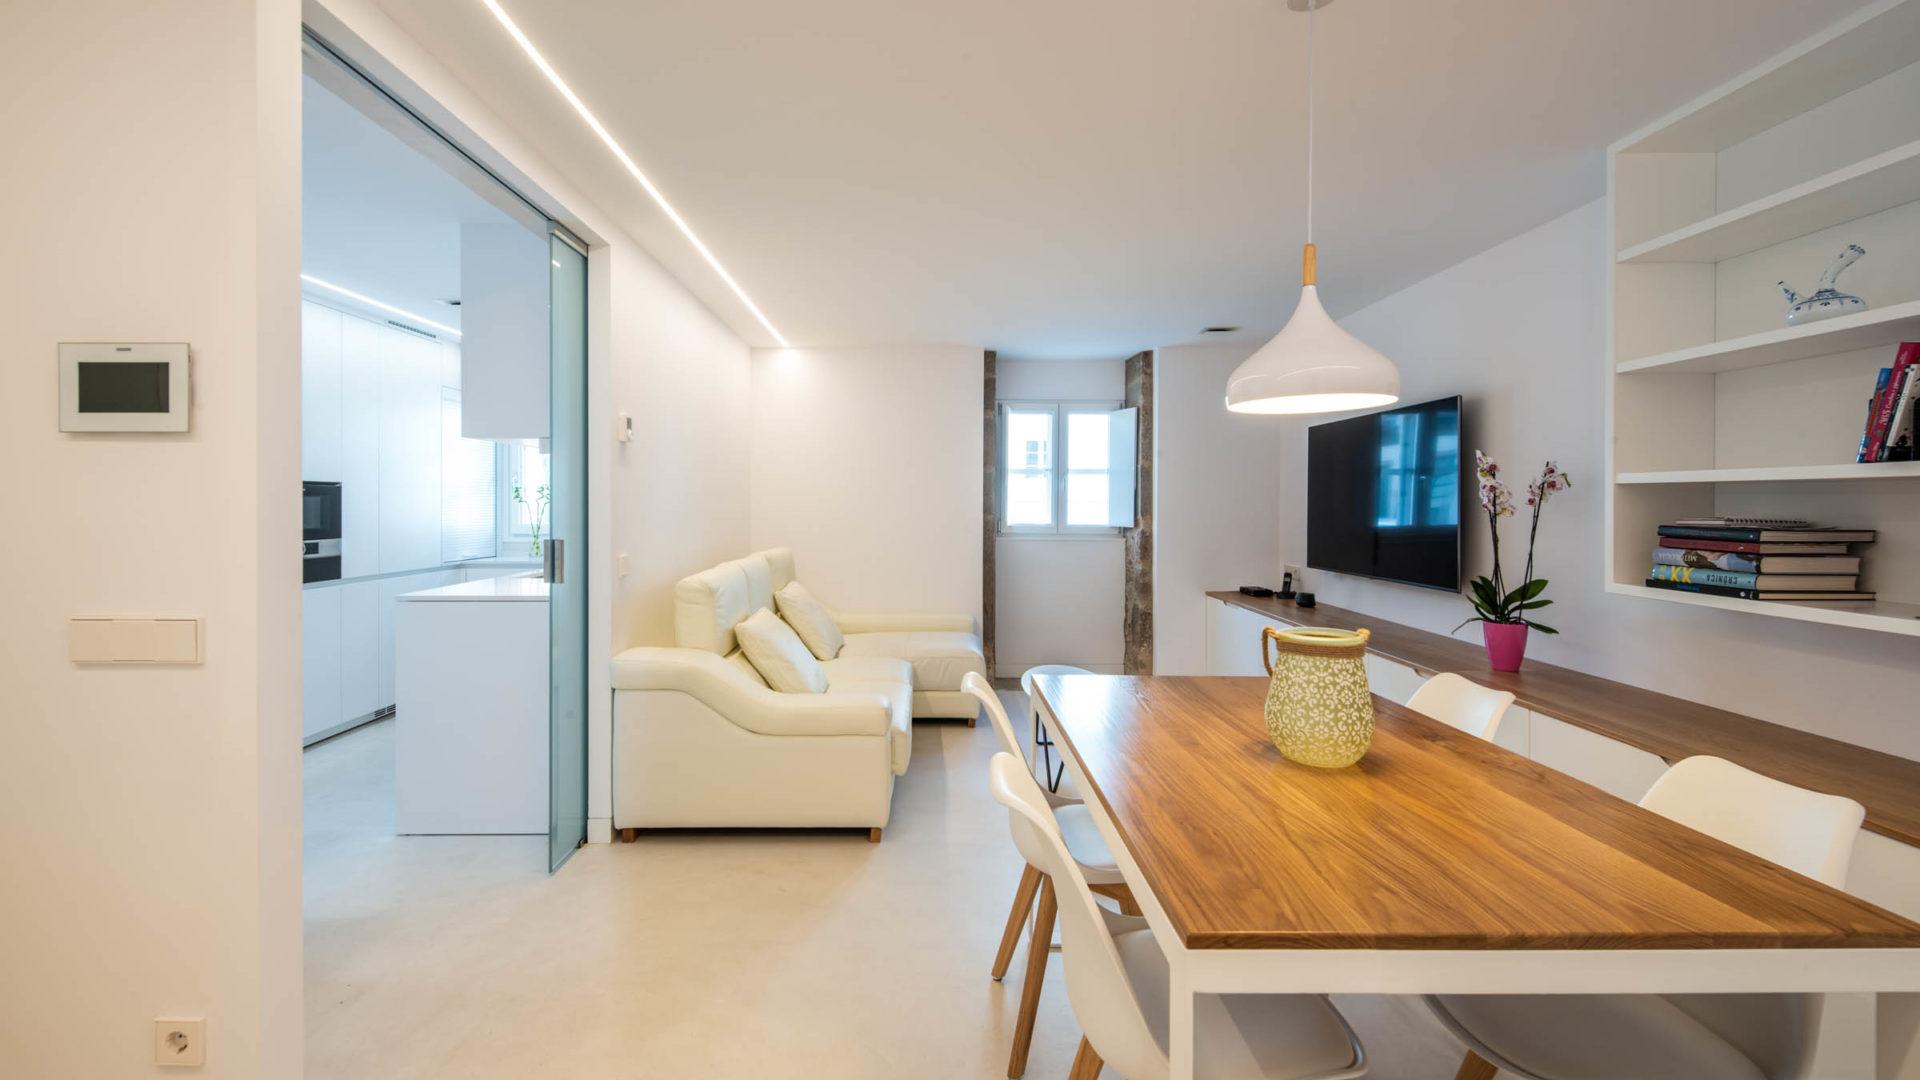 Cocina pequeña en paralelo blanca Santiago Interiores